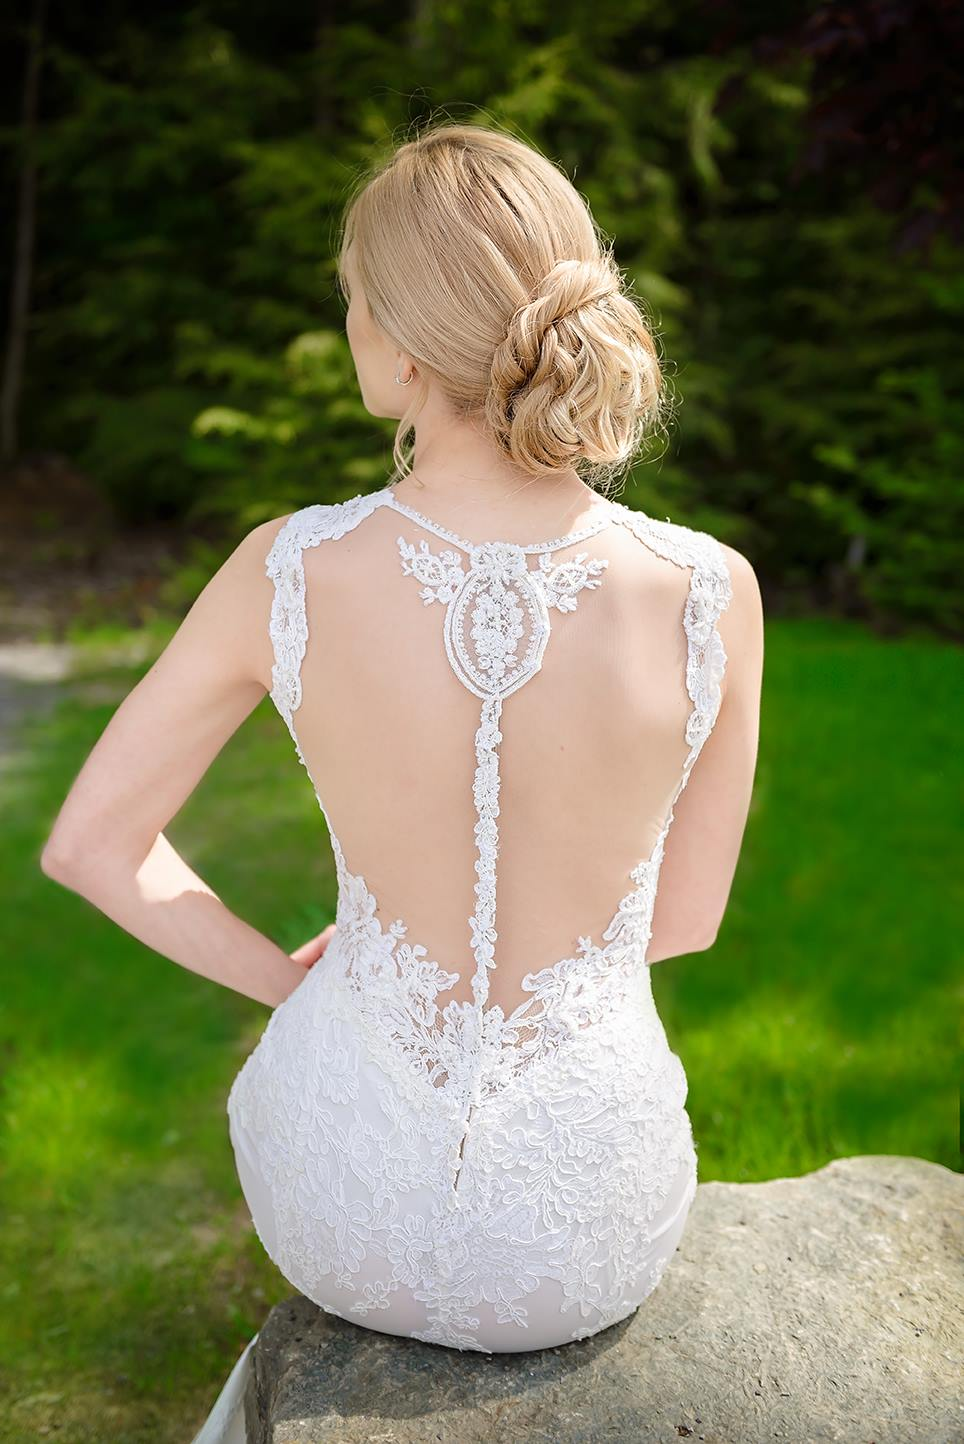 robe de mariee montreal sur mesure haute couture dos ouvert dentelle